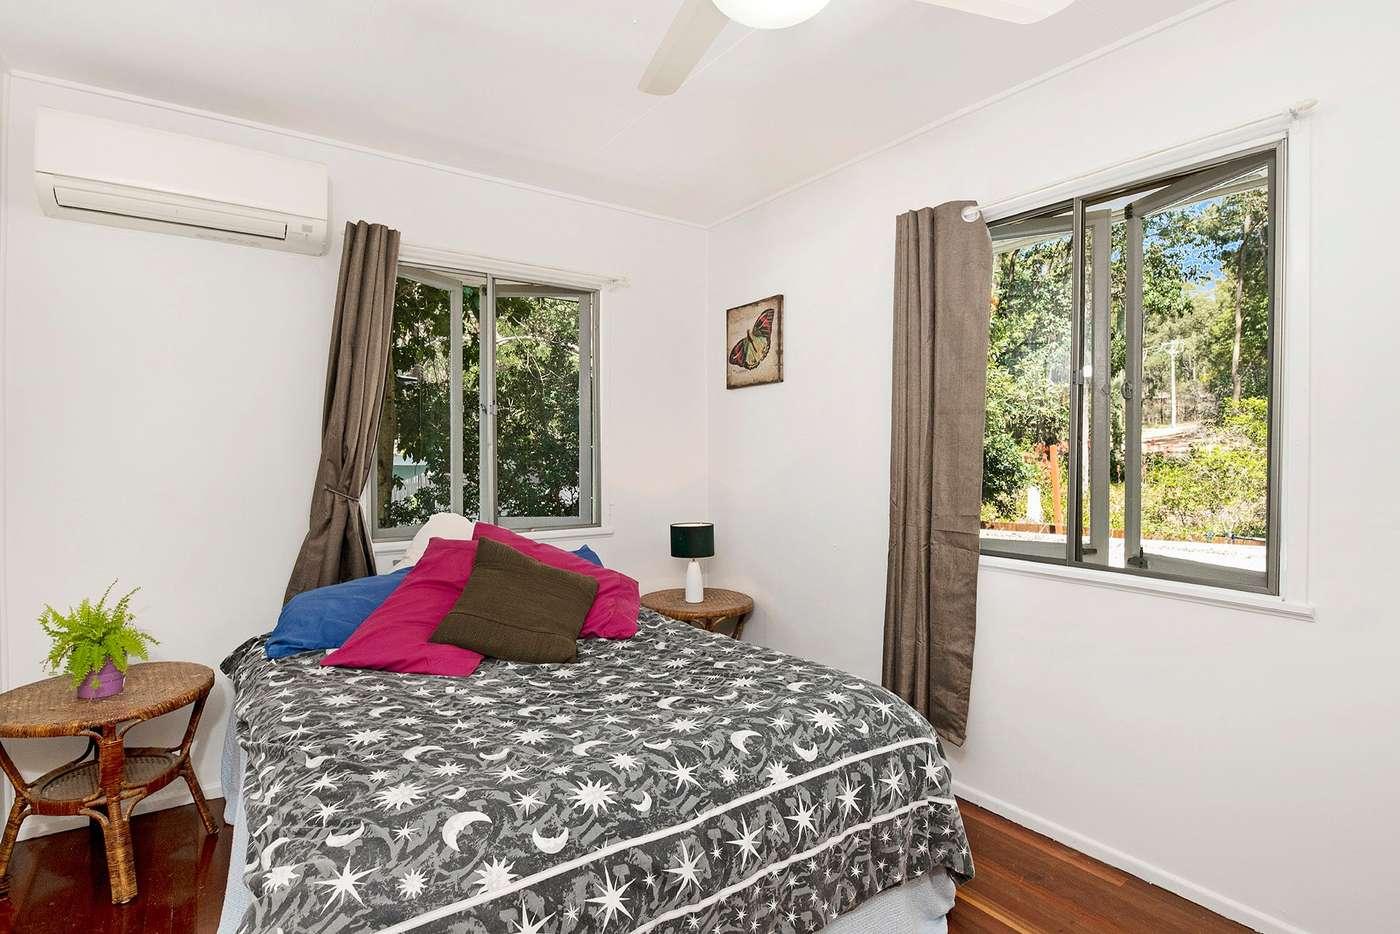 Sixth view of Homely house listing, 42 Verbena Street, Mount Gravatt QLD 4122